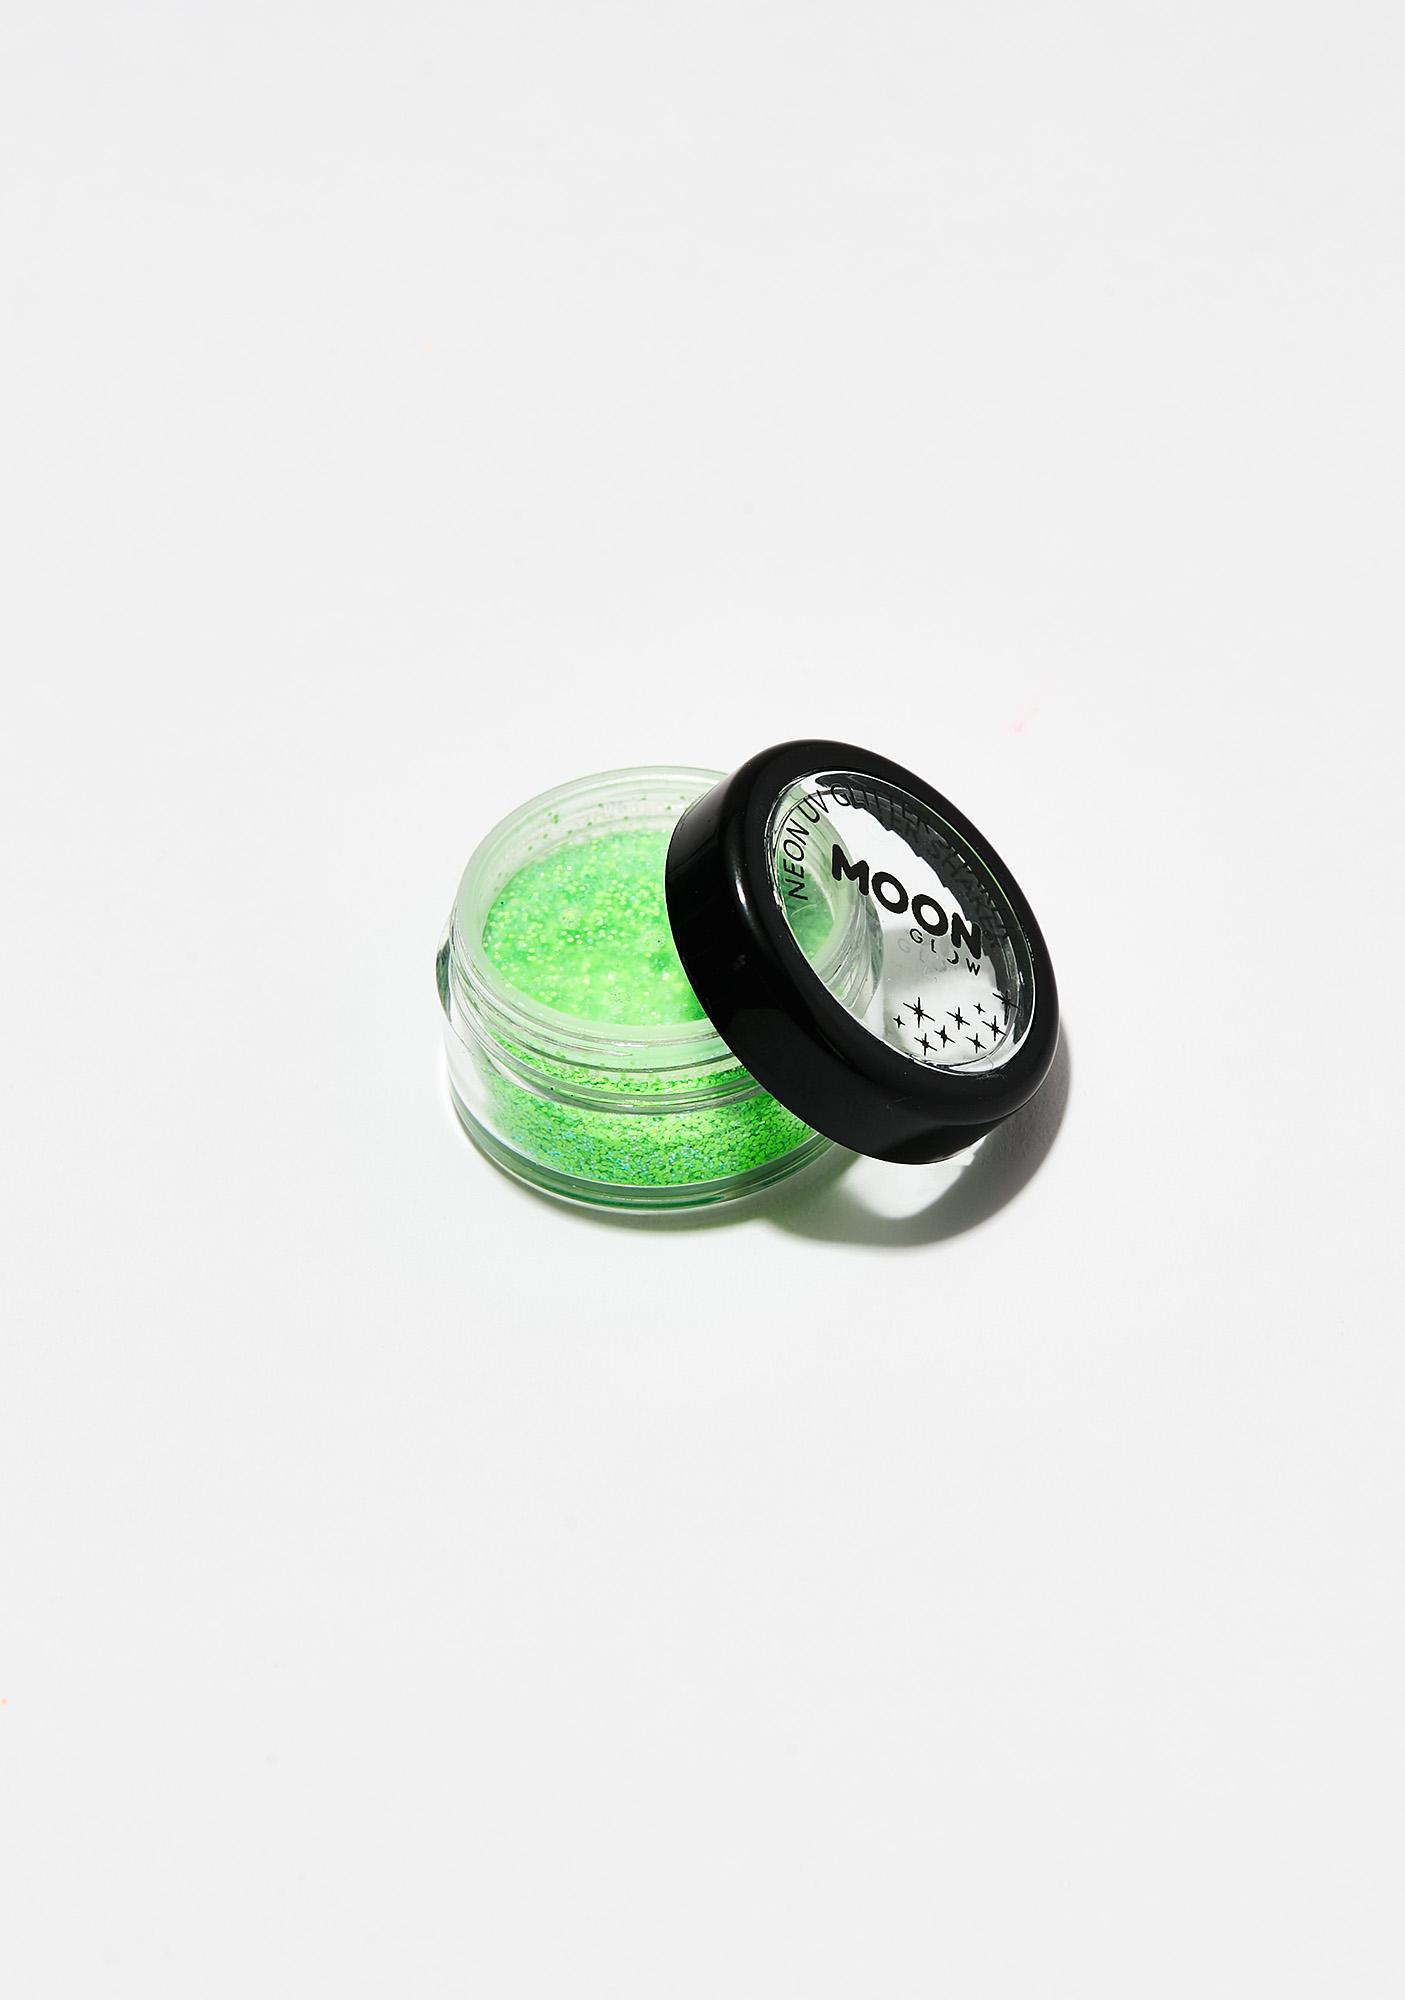 Moon Creations Neon Green UV Glitter Shaker